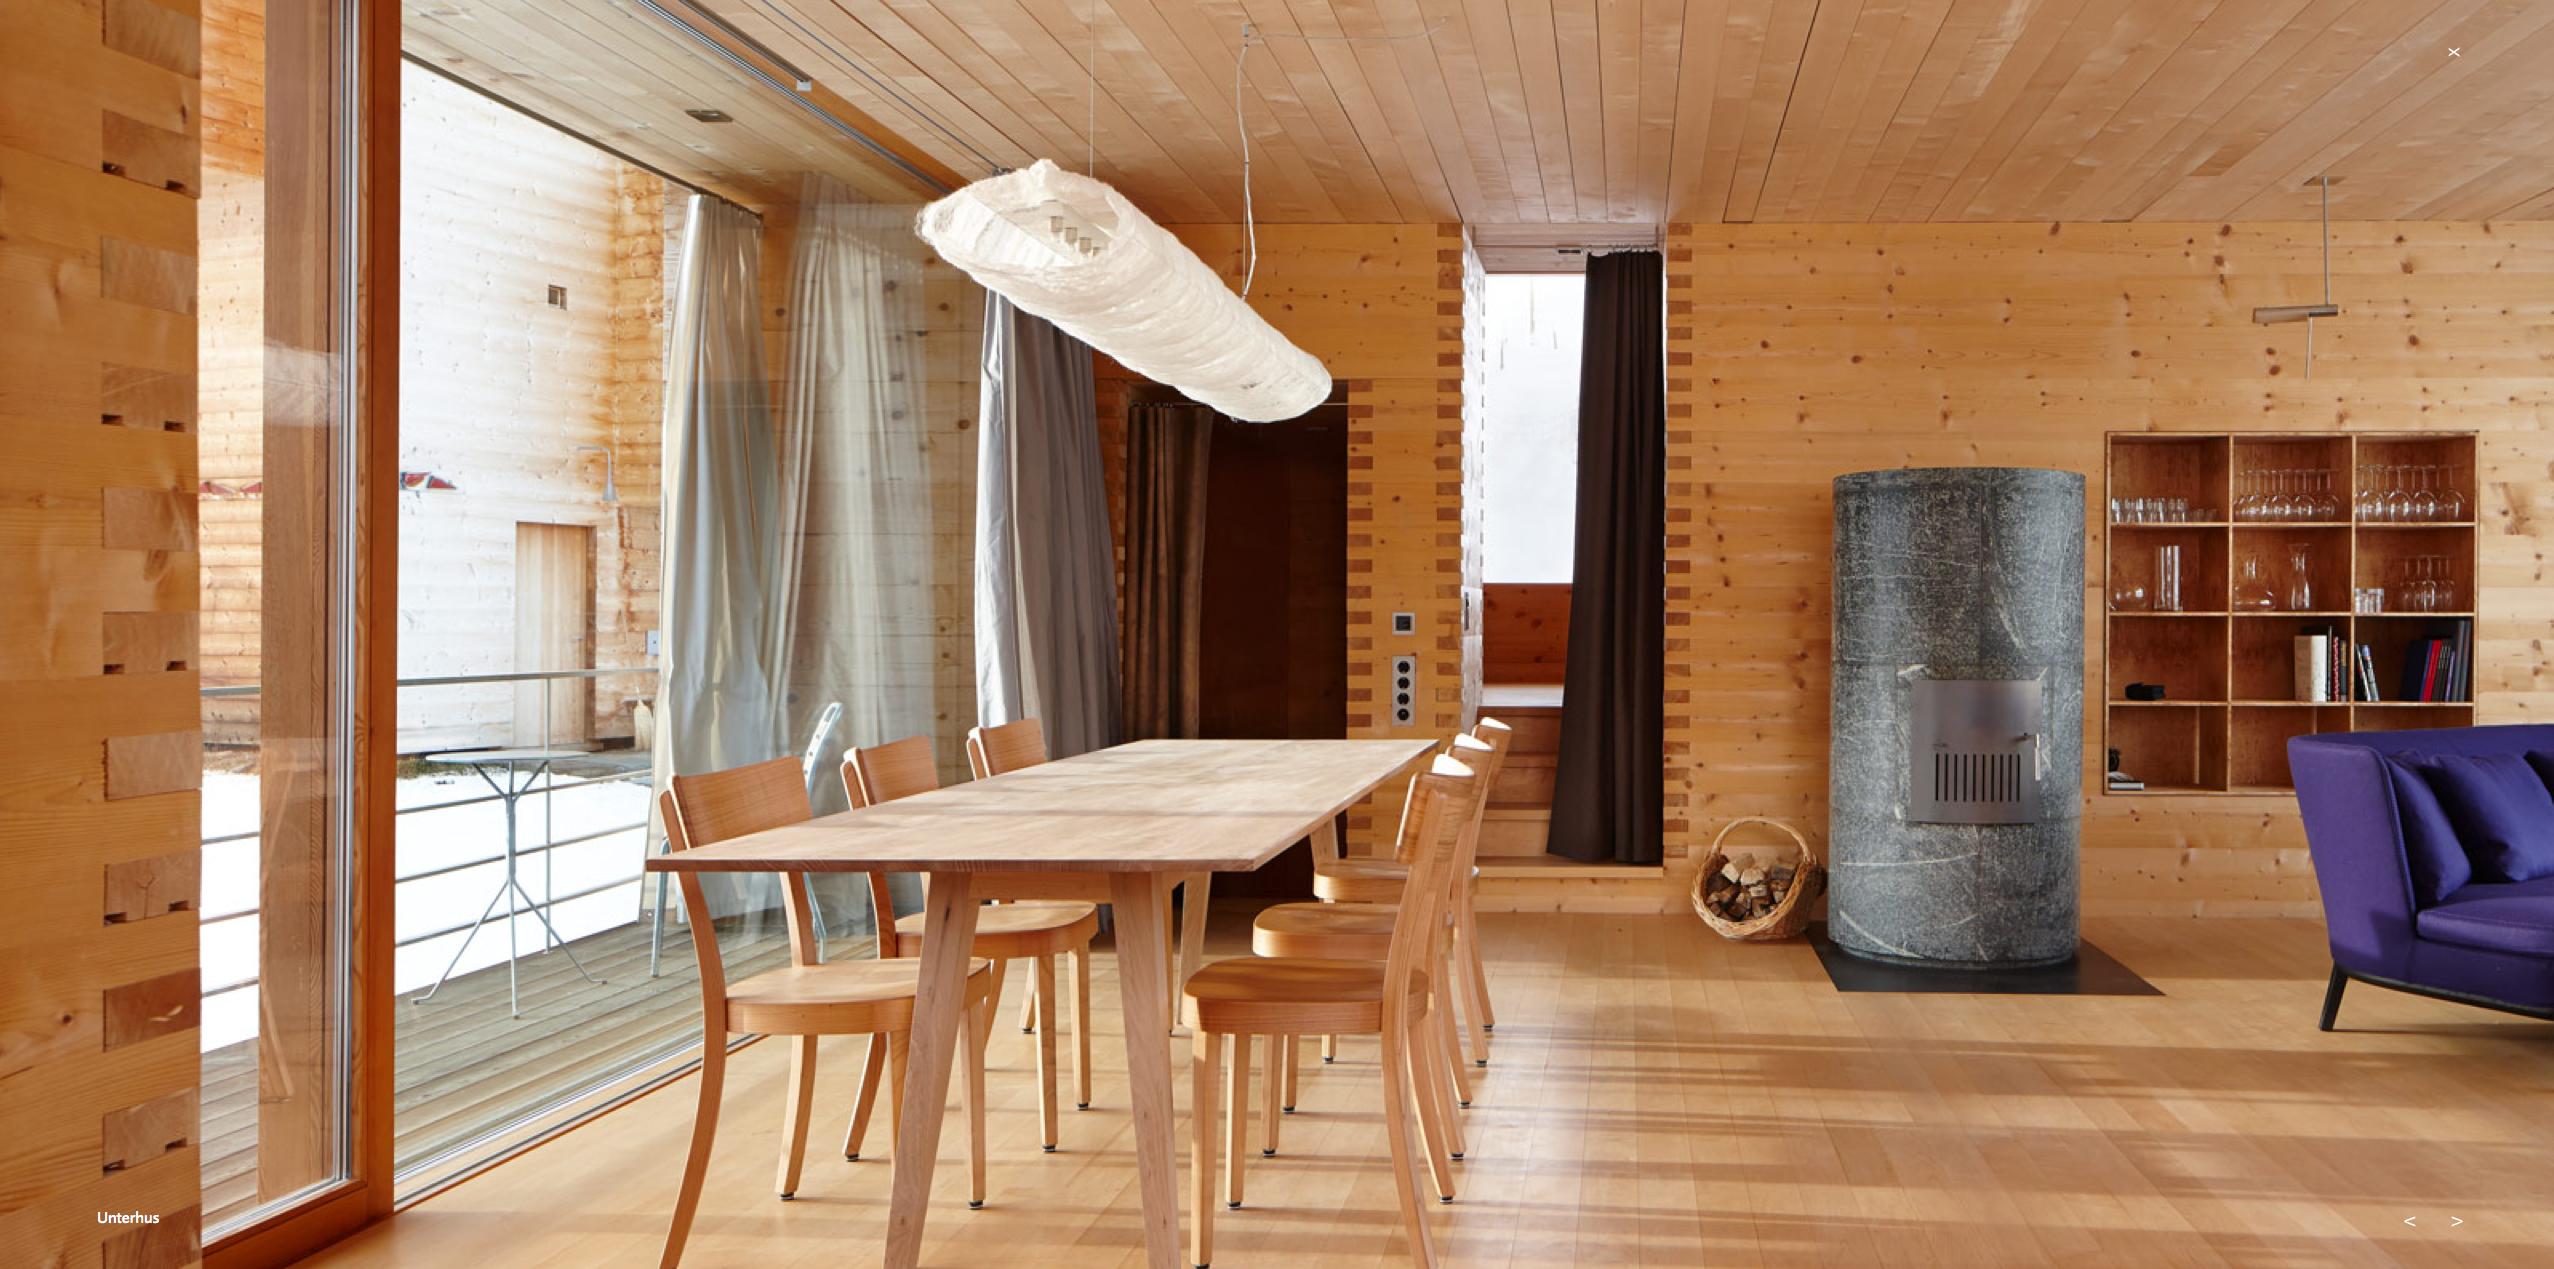 Peter Zumthor Cabins : Vals Switzerland | zumthor. Oberhus ...